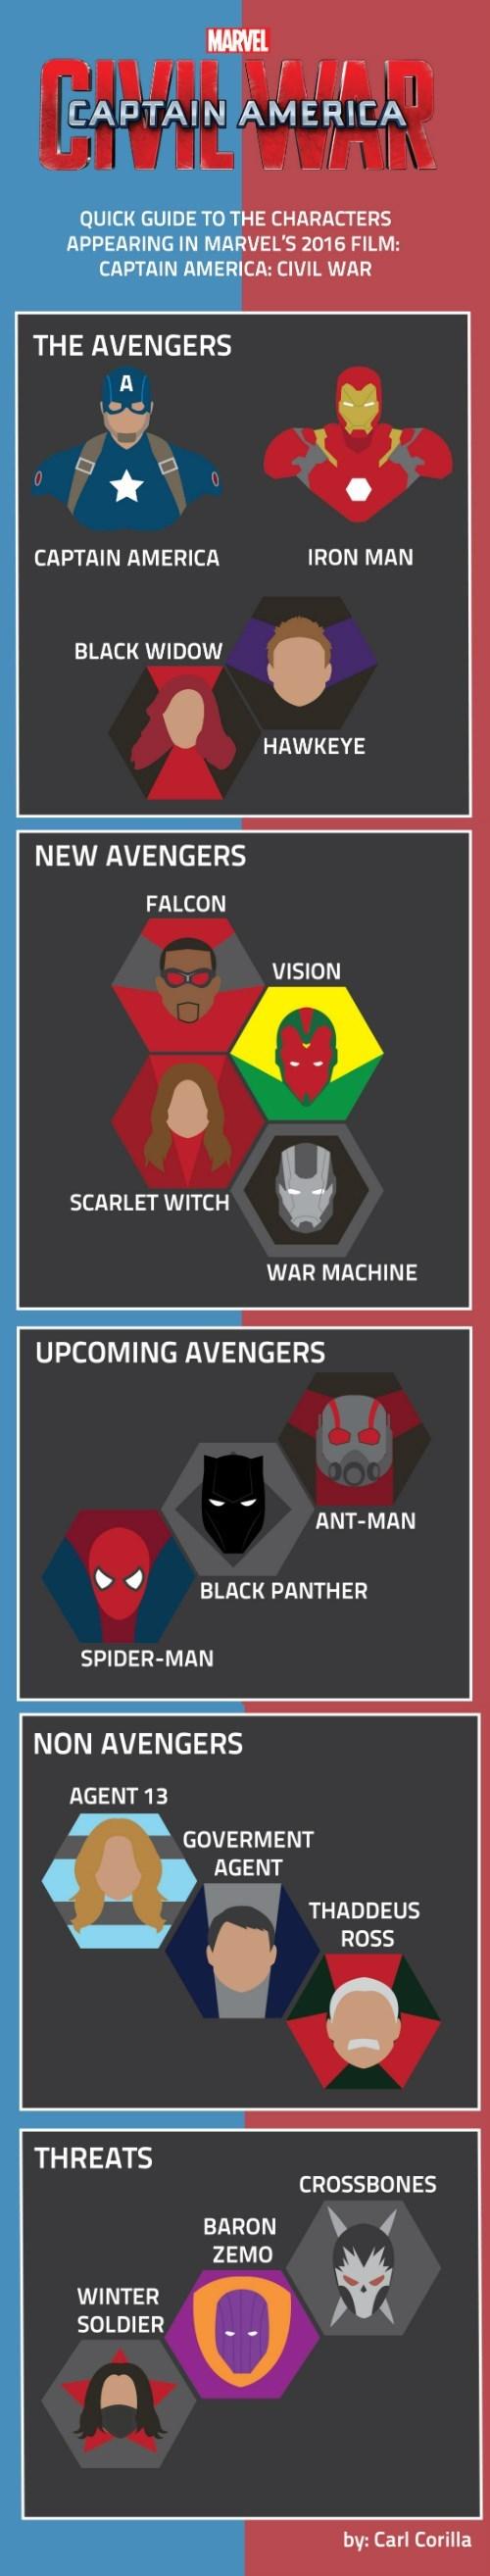 superheroes-captain-america-marvel-civil-war-avengers-infographic-guide